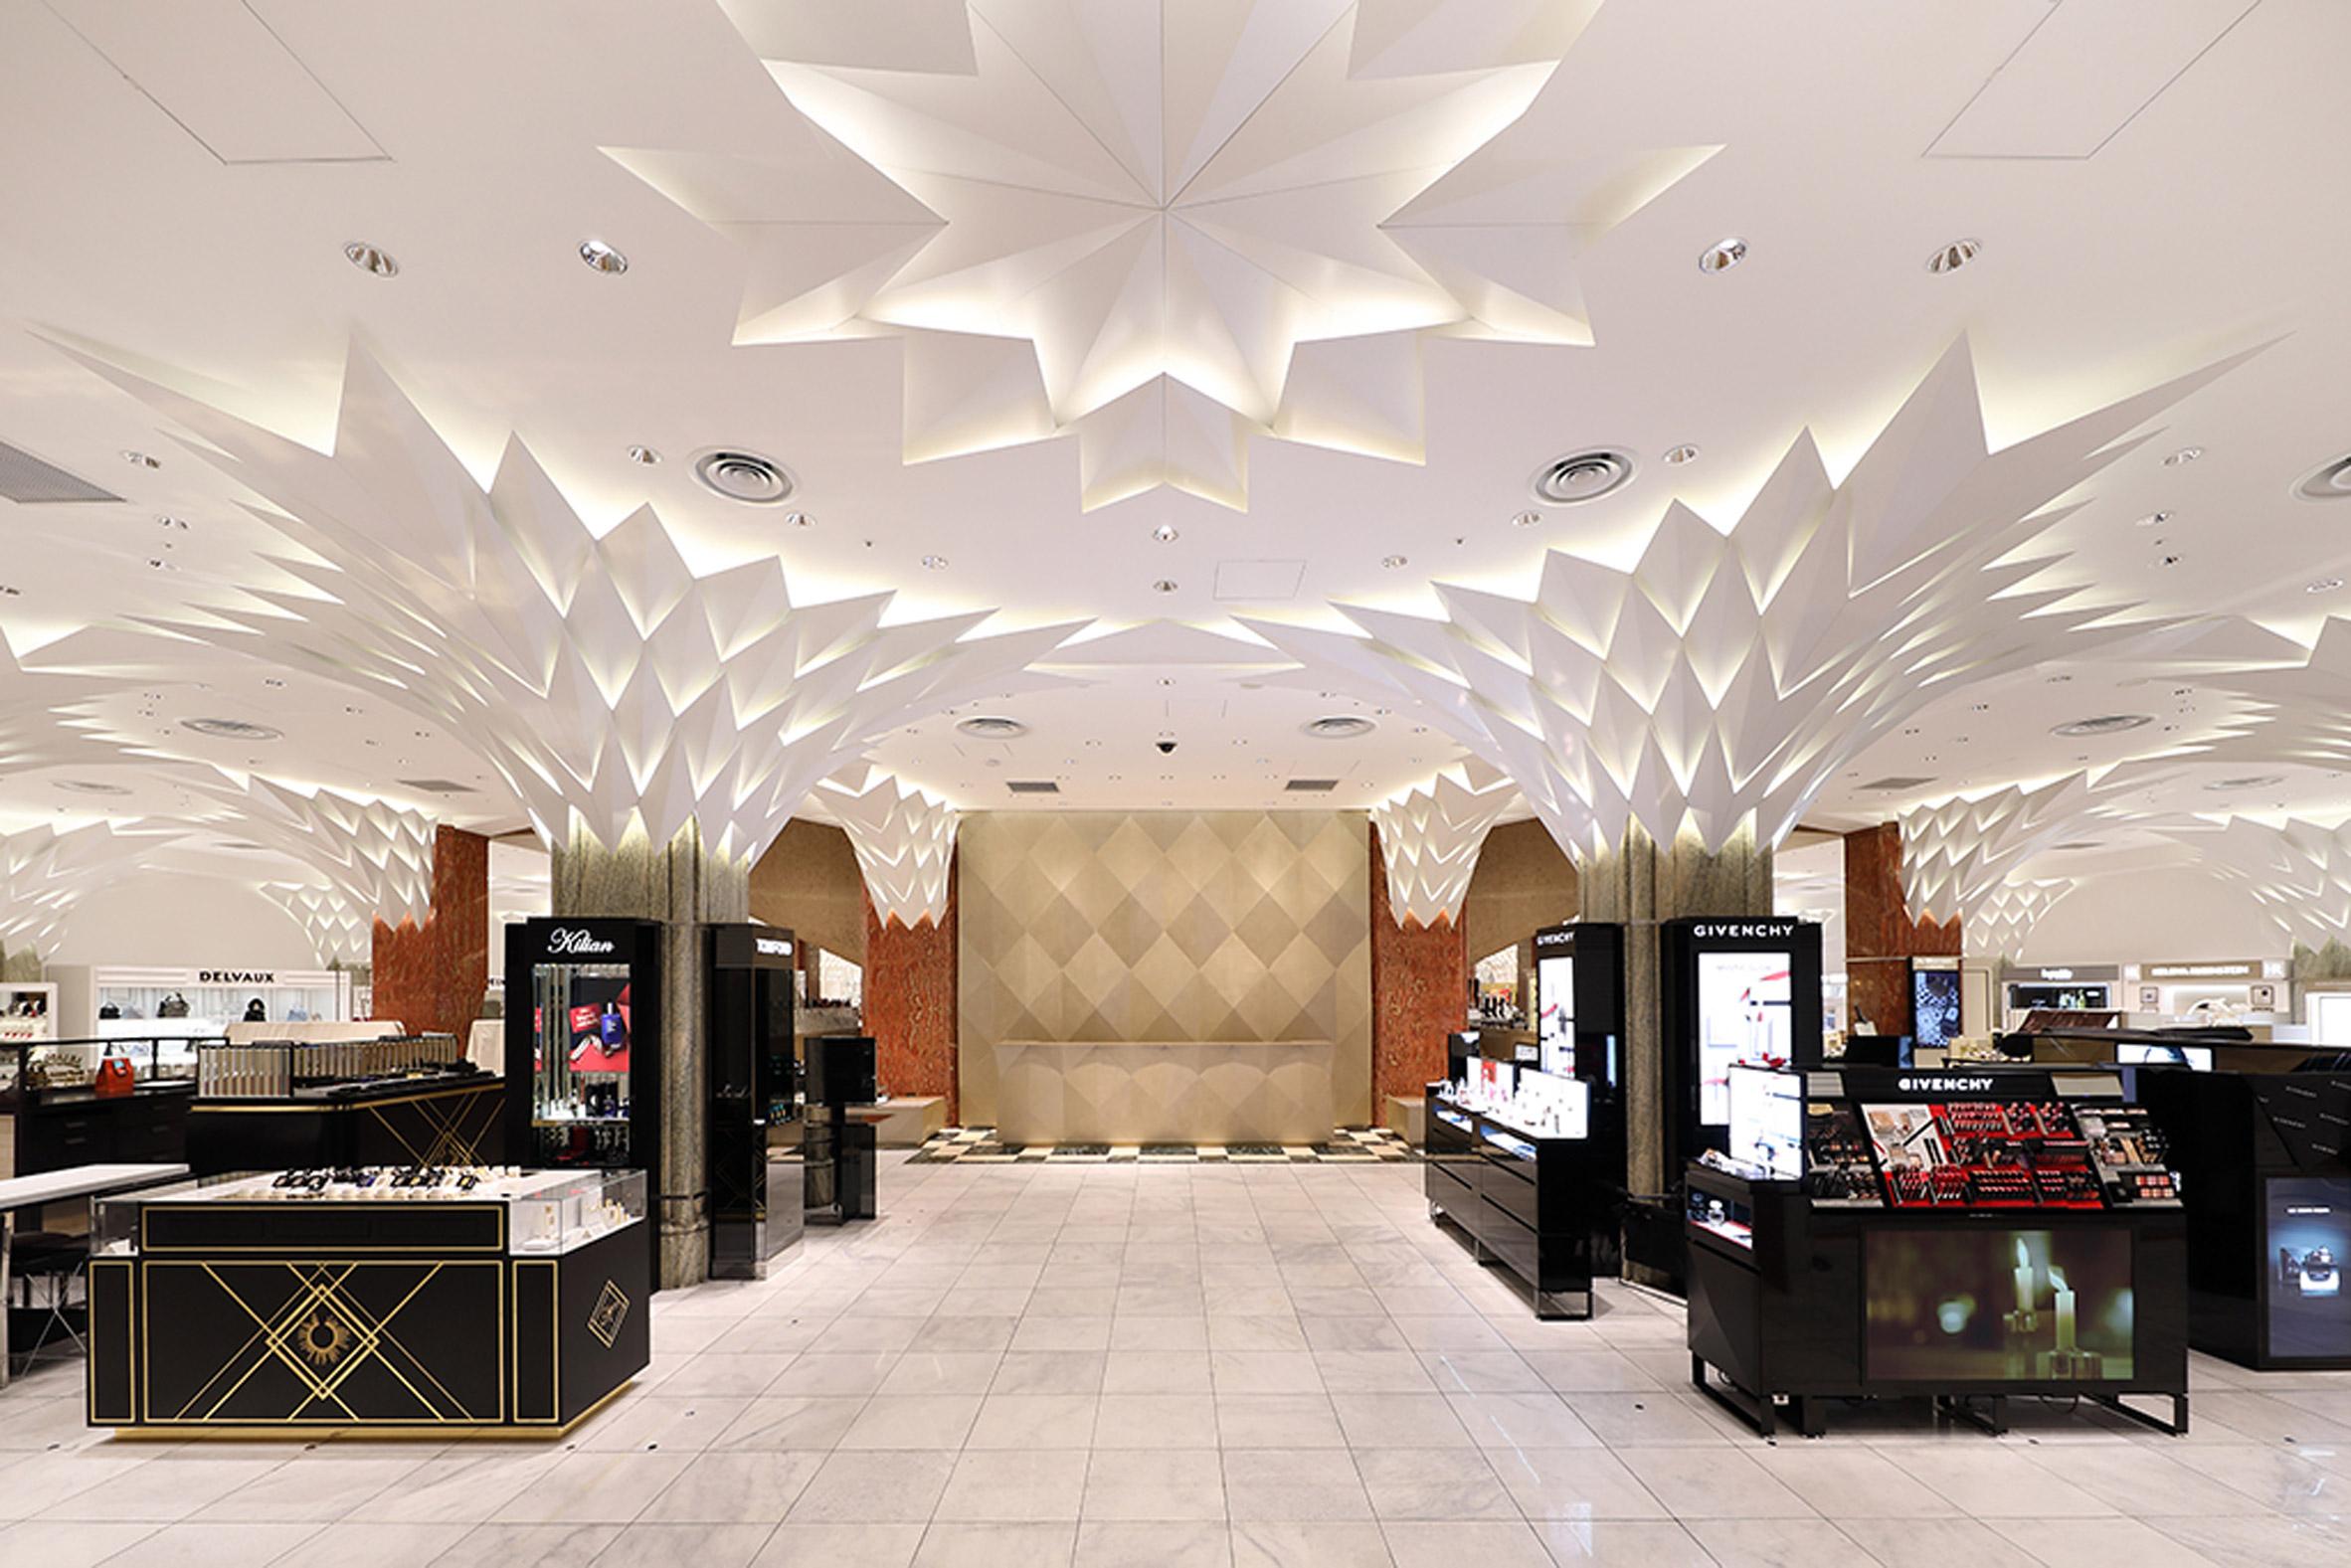 Shop floor of Nihombashi Mitsukoshi by Lighting Planners Associates